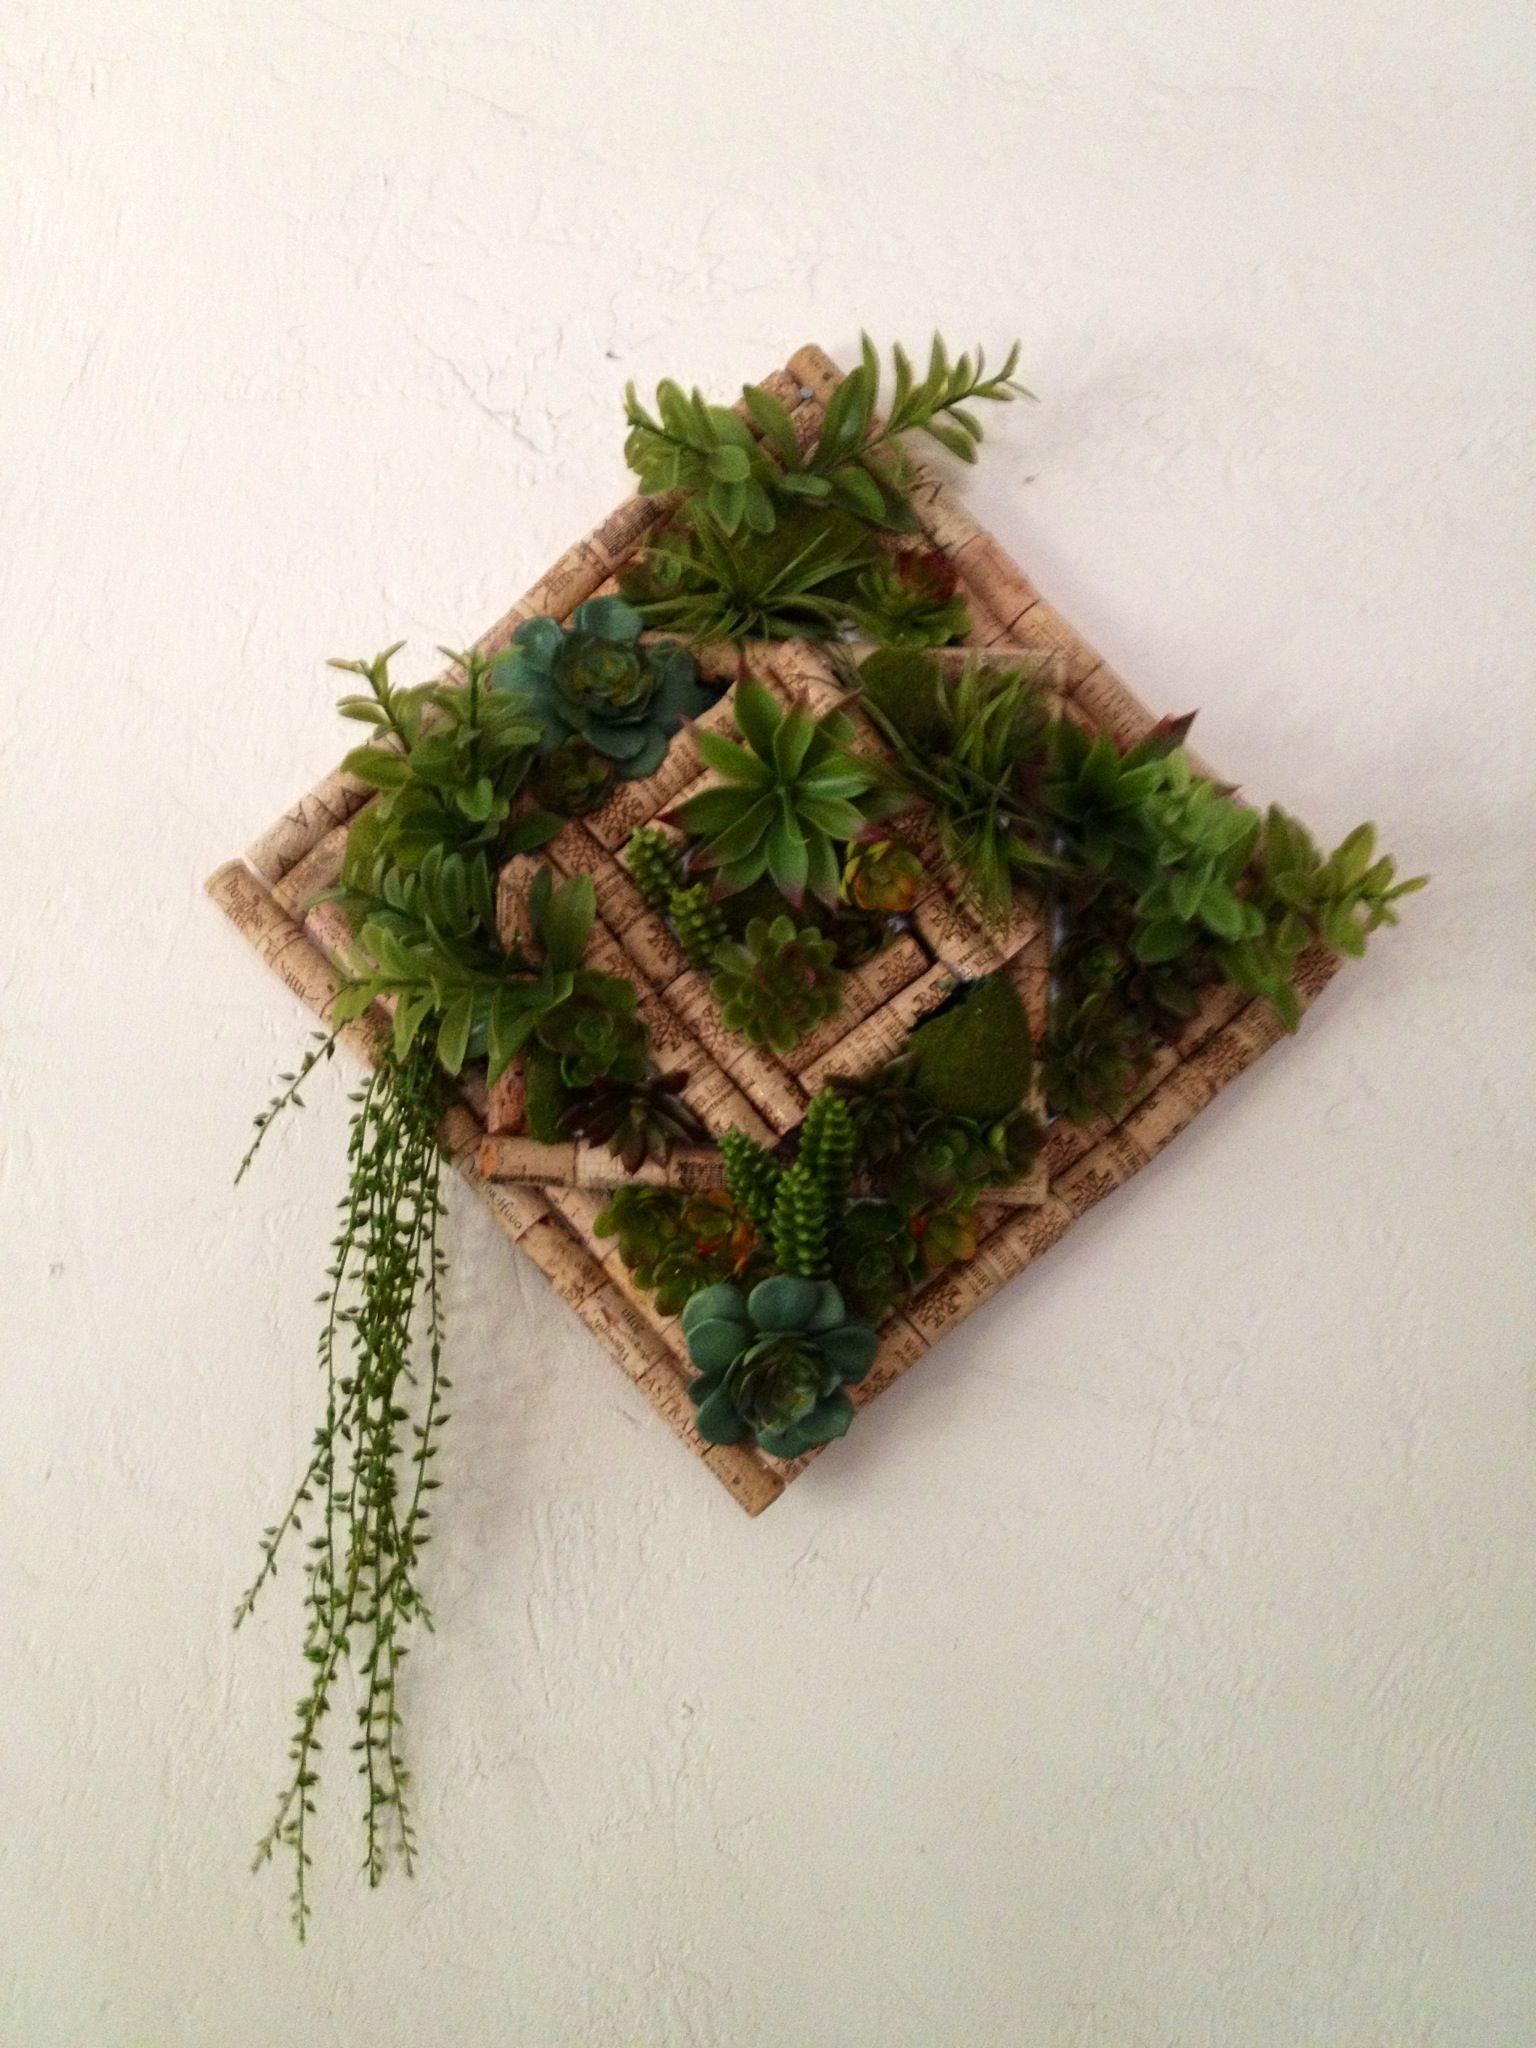 Faux succulent garden in wine cork frame. Cork art, folk ...